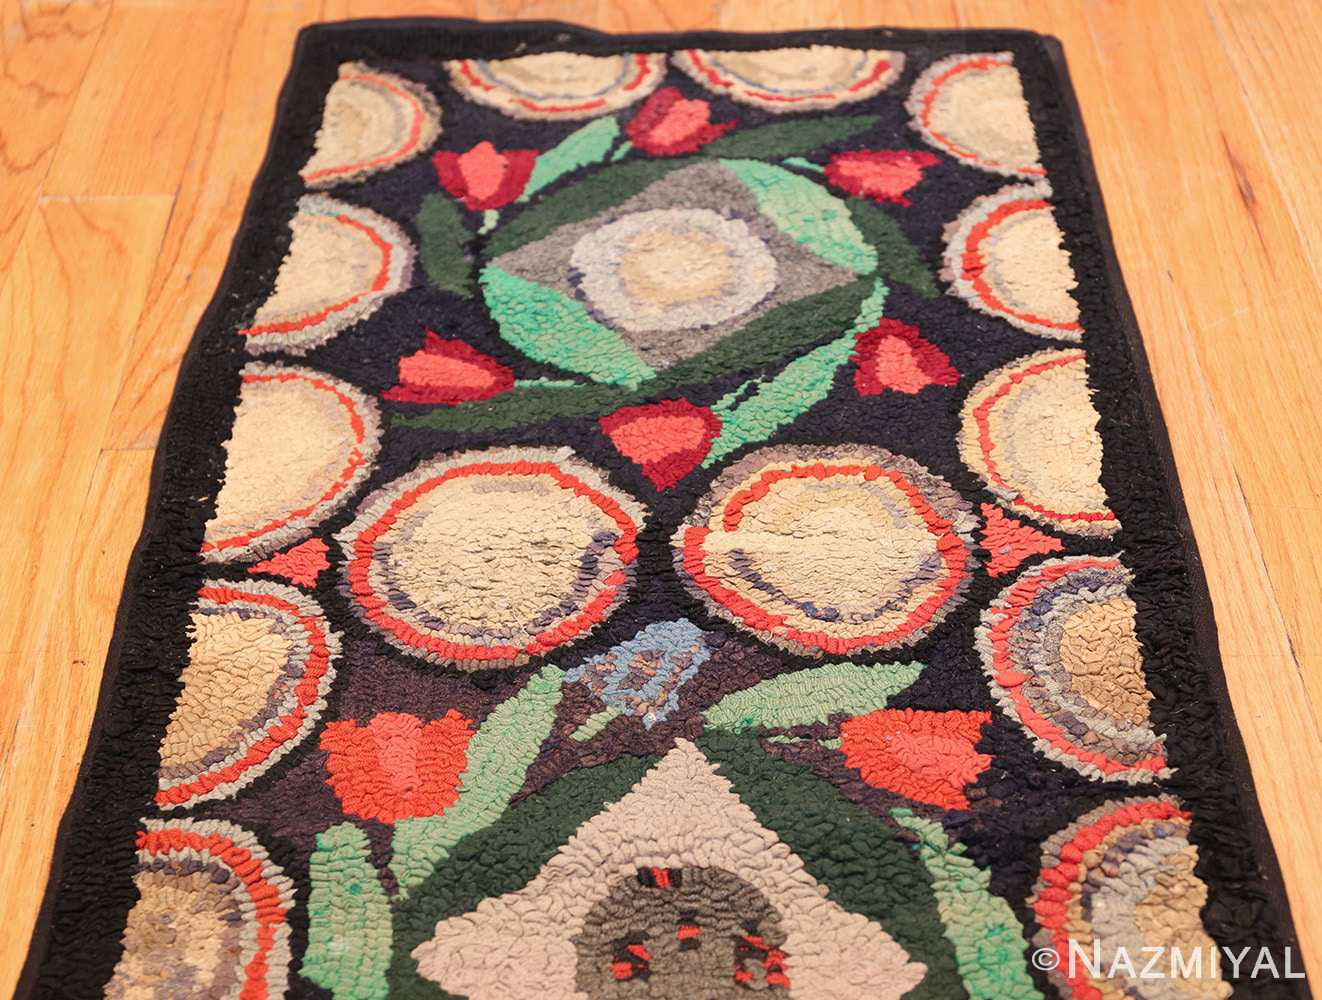 long antique art deco american hooked rug runner 49526 top Nazmiyal